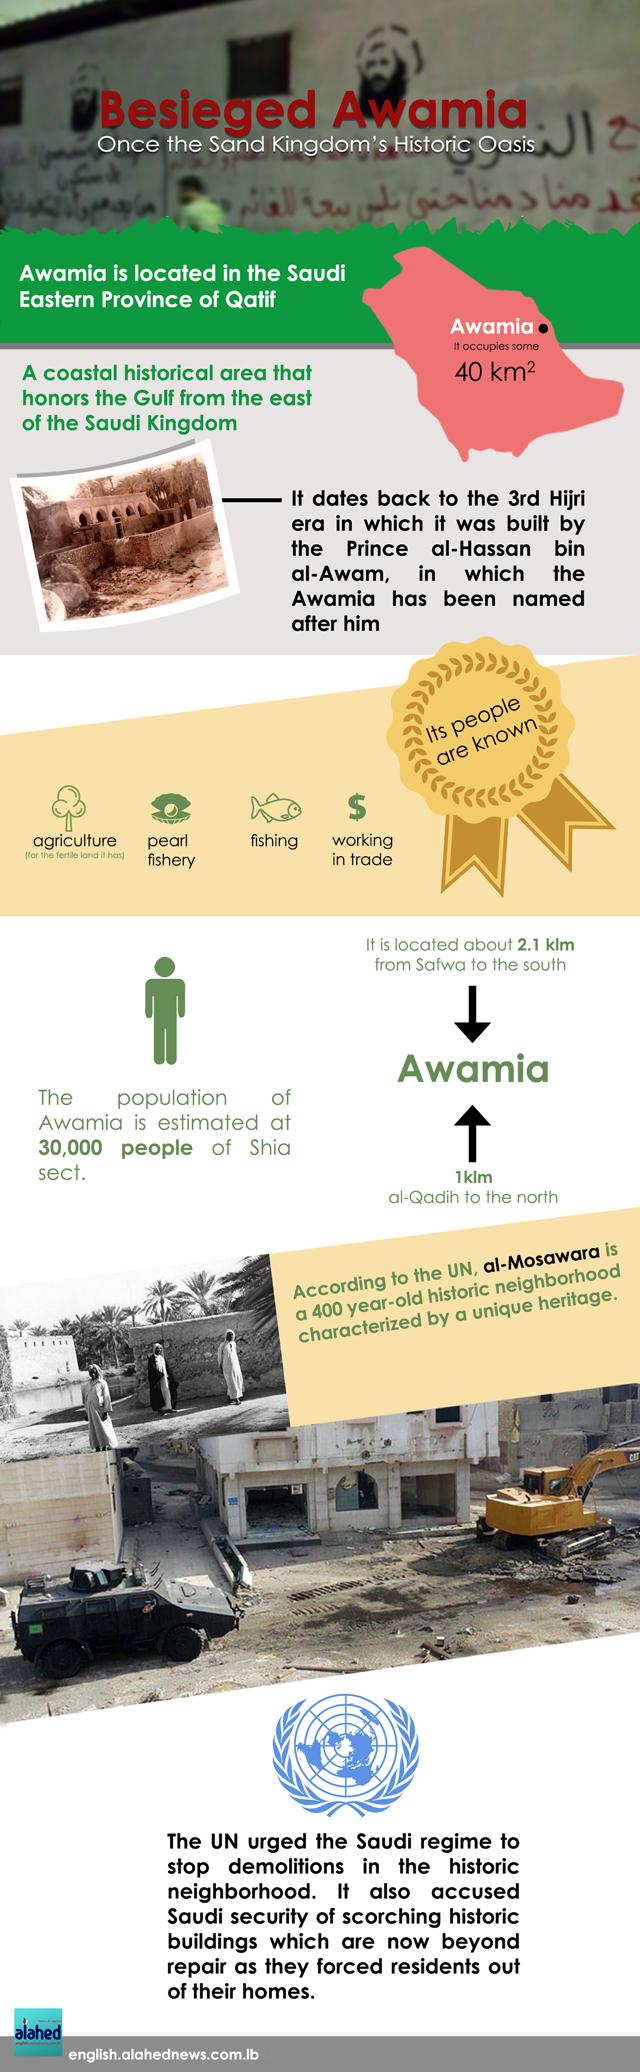 Besieged #Awamia: Once the Sand Kingdom's Historic Oasis